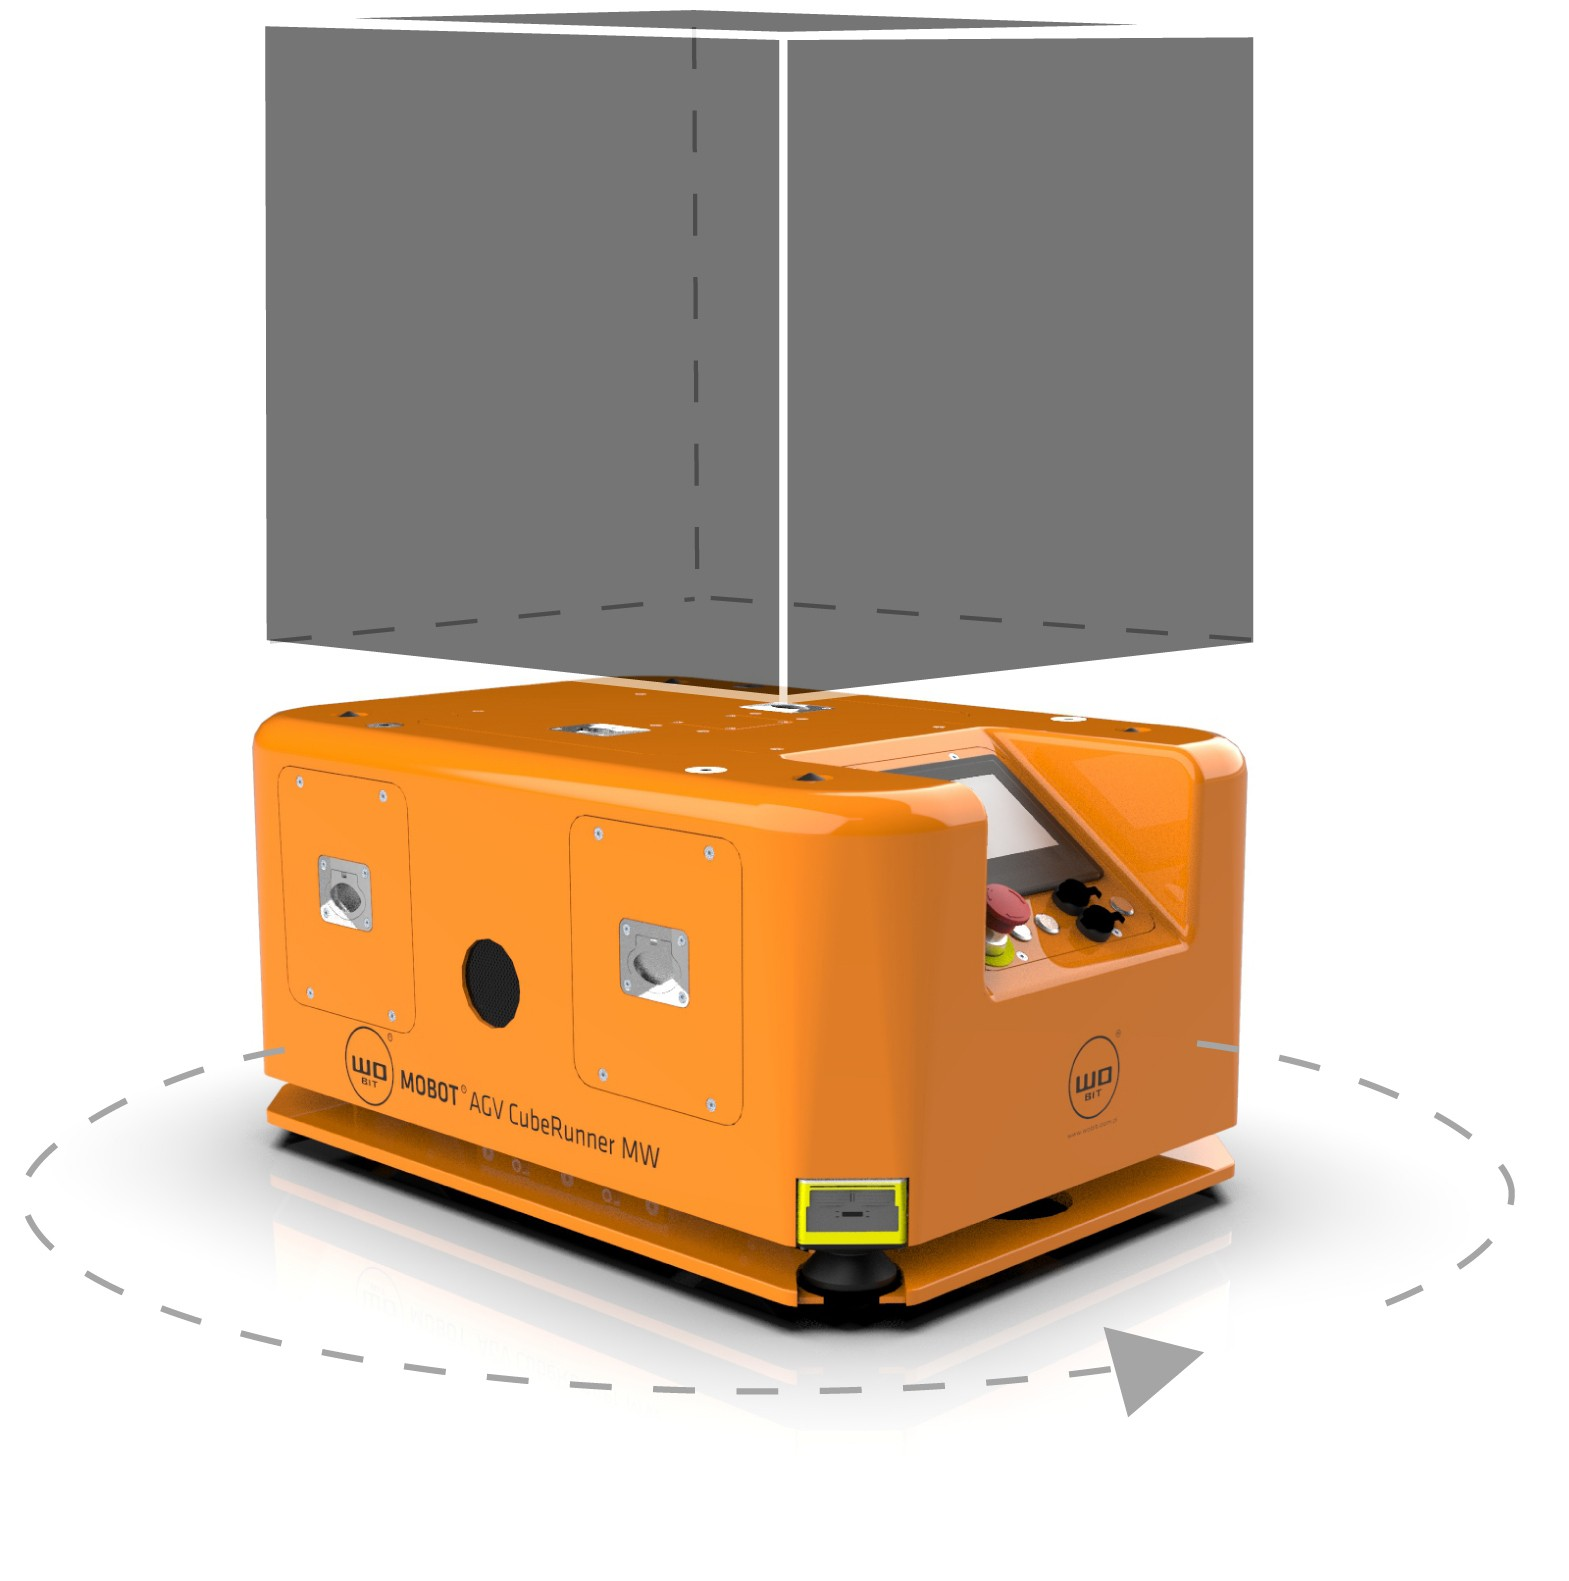 MOBOT® AGV CubeRunner MWmobile robot